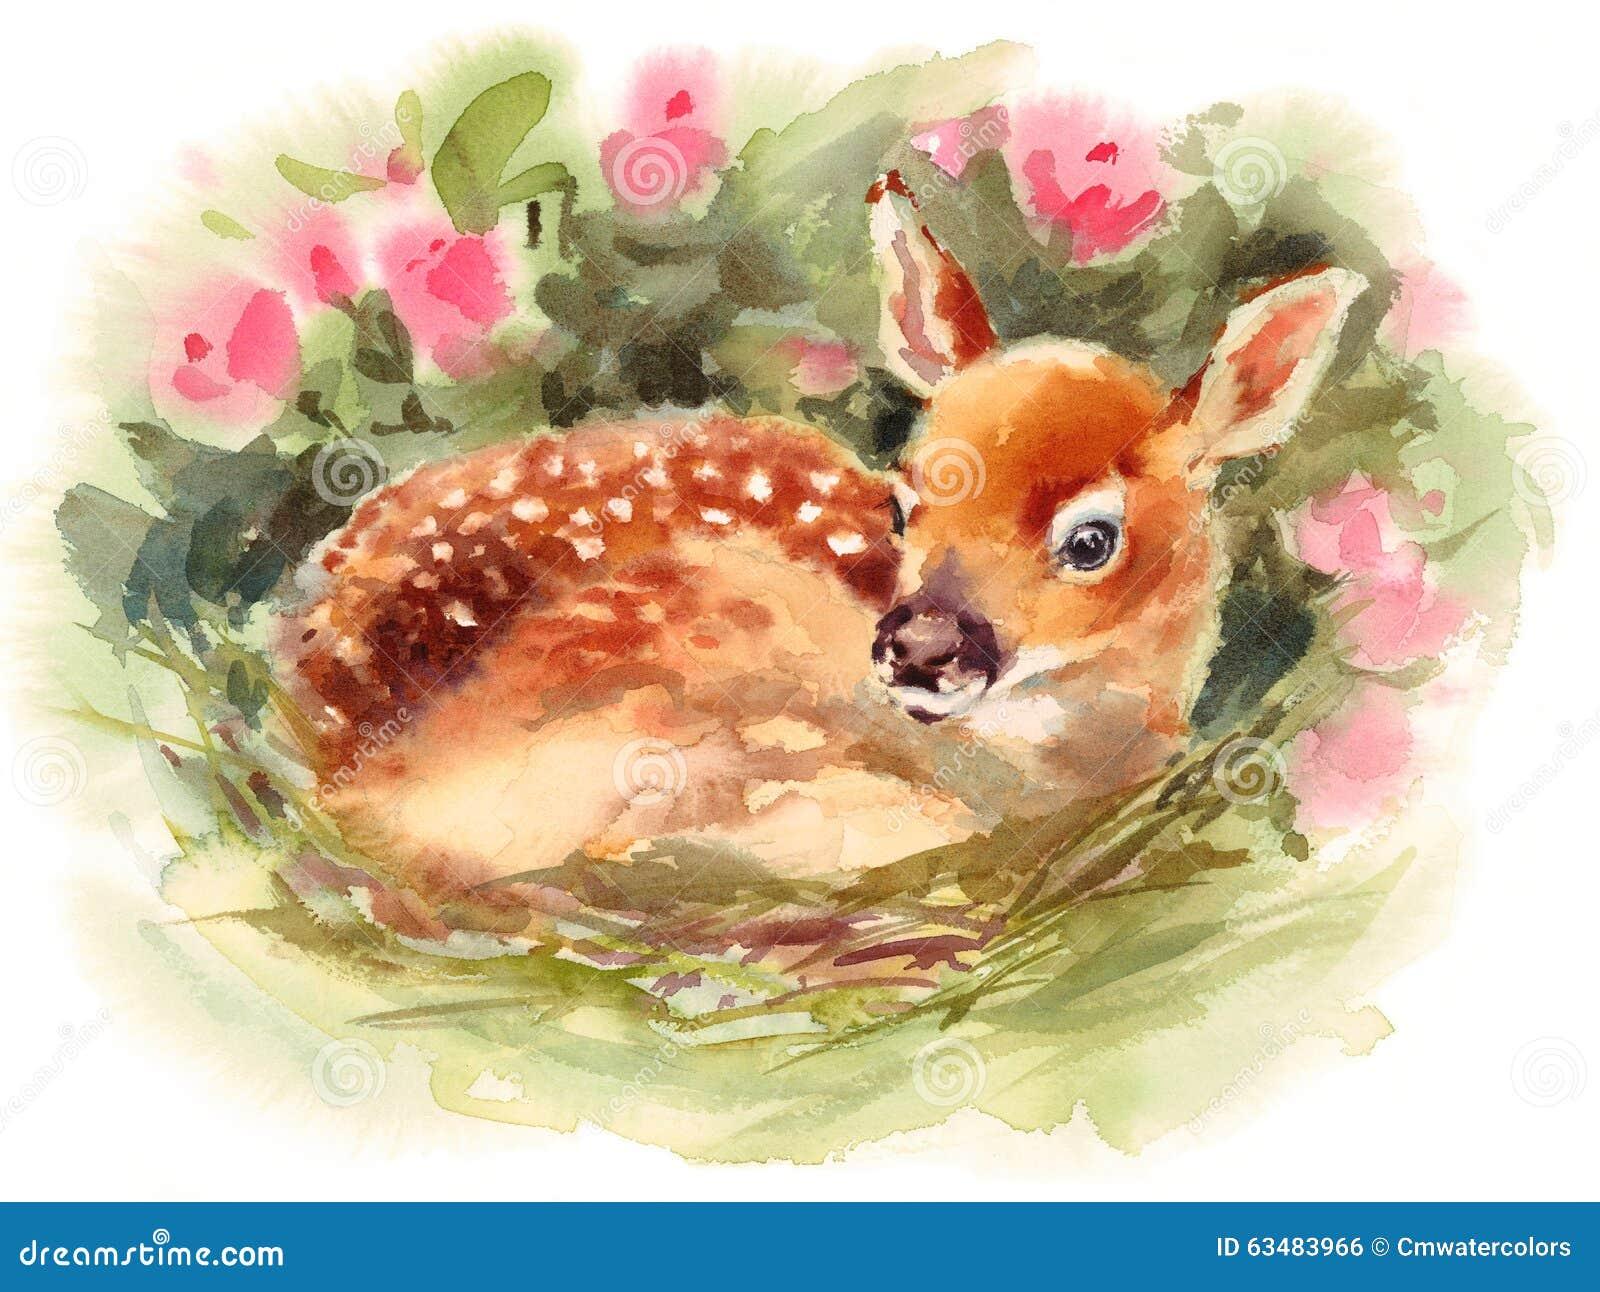 Baby-Rotwild umgeben durch Blumen Aquarell Fawn Animal Illustration Hand Painted